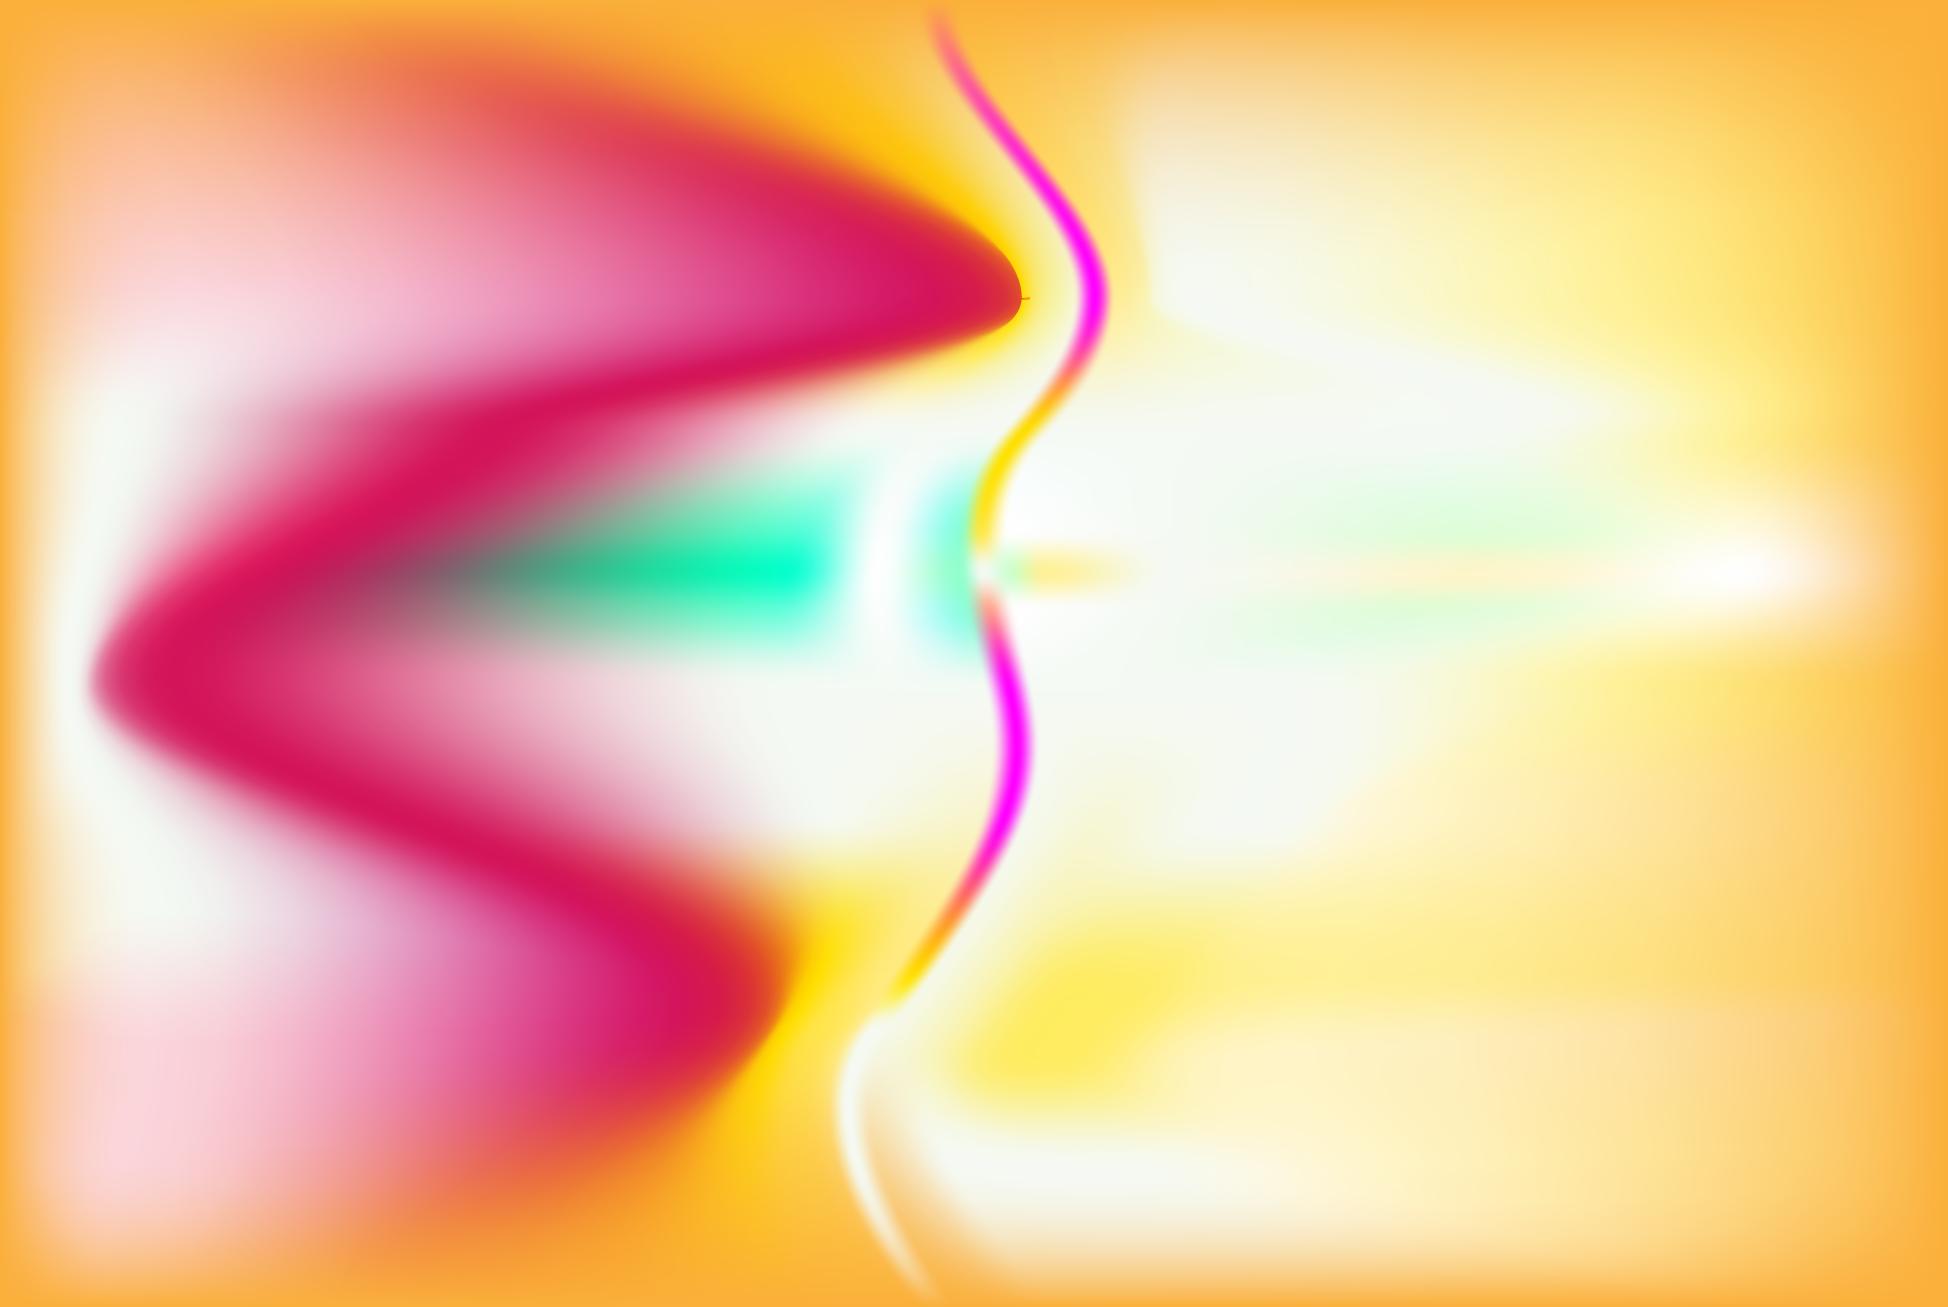 Osculum_digital_art_ron_ralbyrzz_rlart_LQ